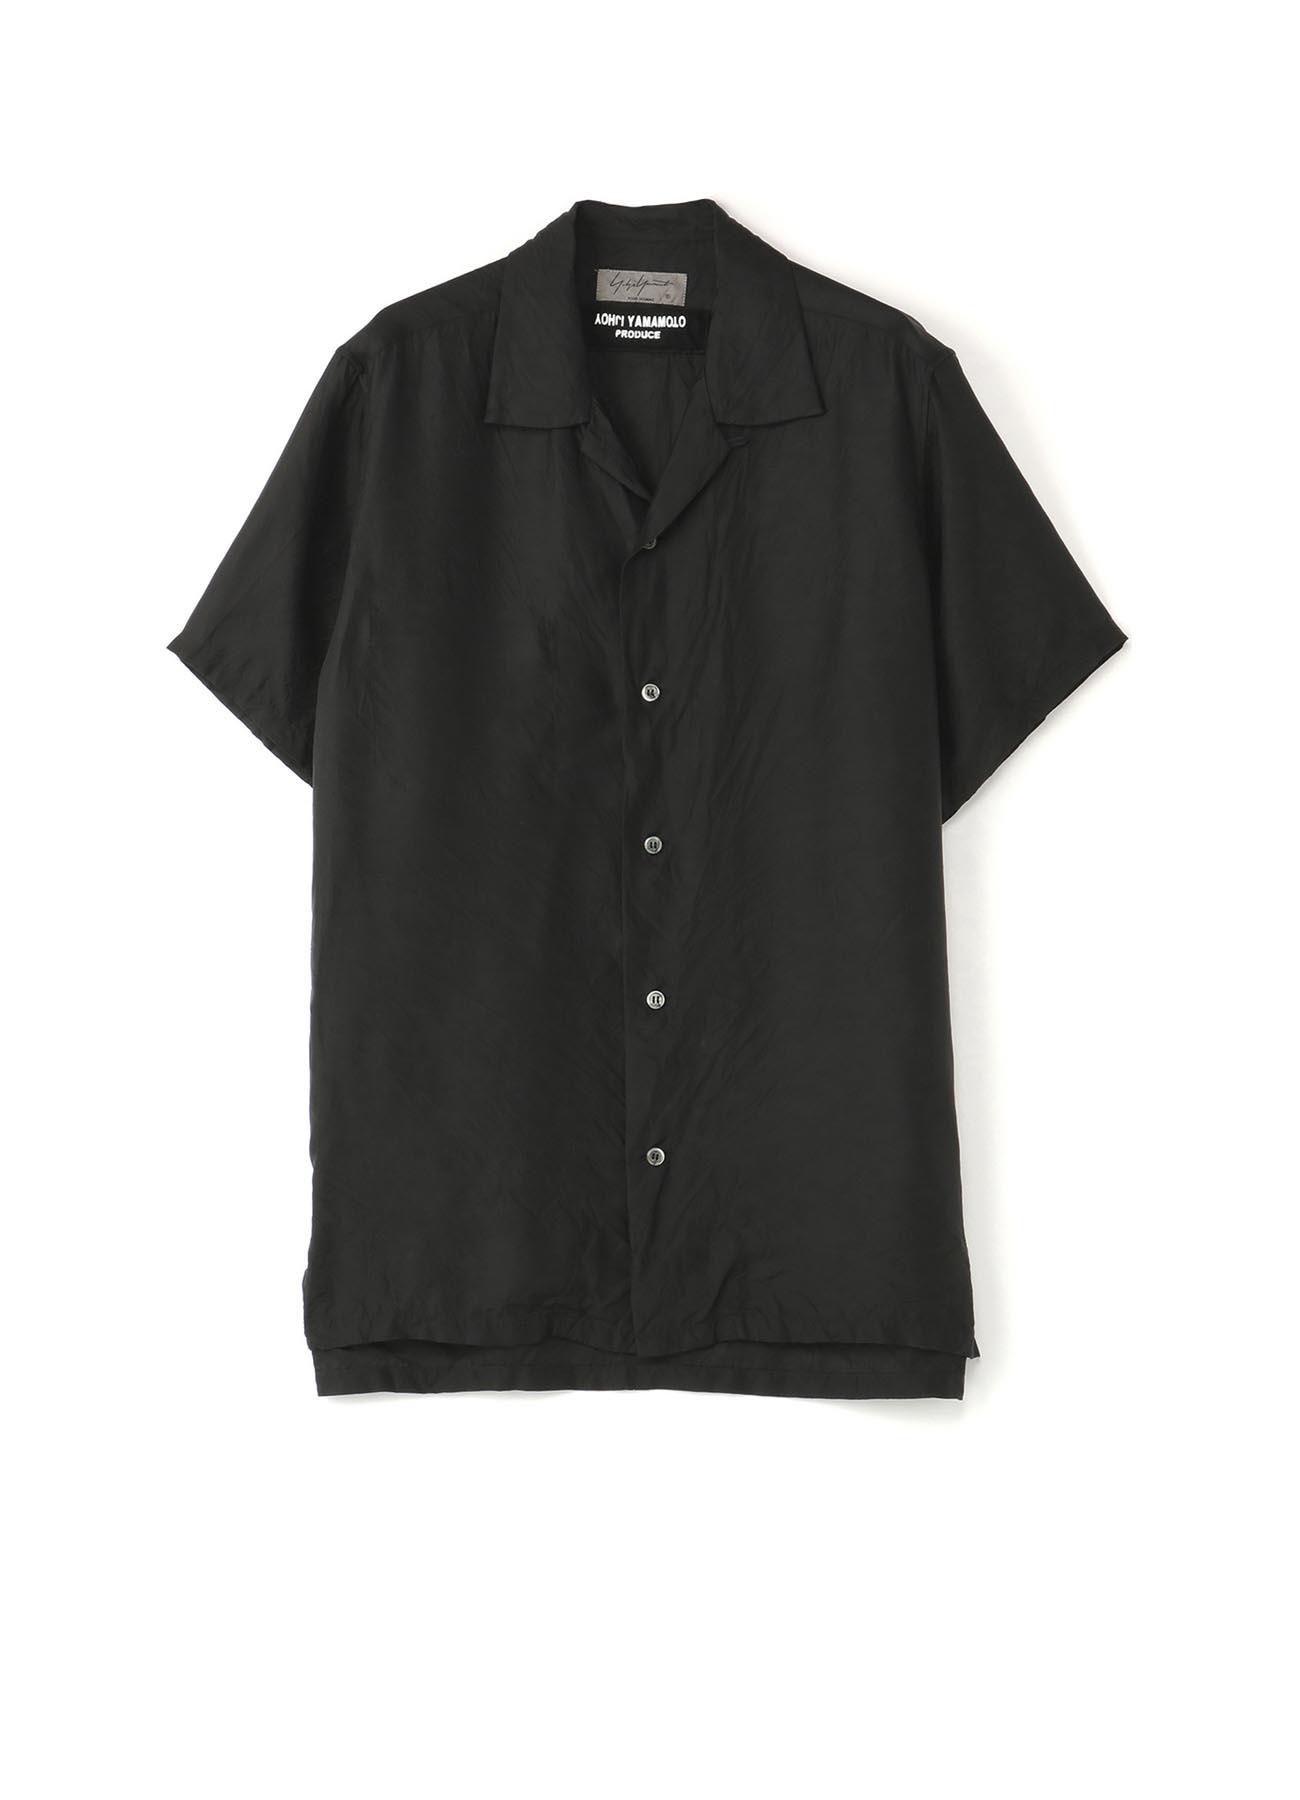 【THE SHOP限定】铜铵嫘縈衬衫